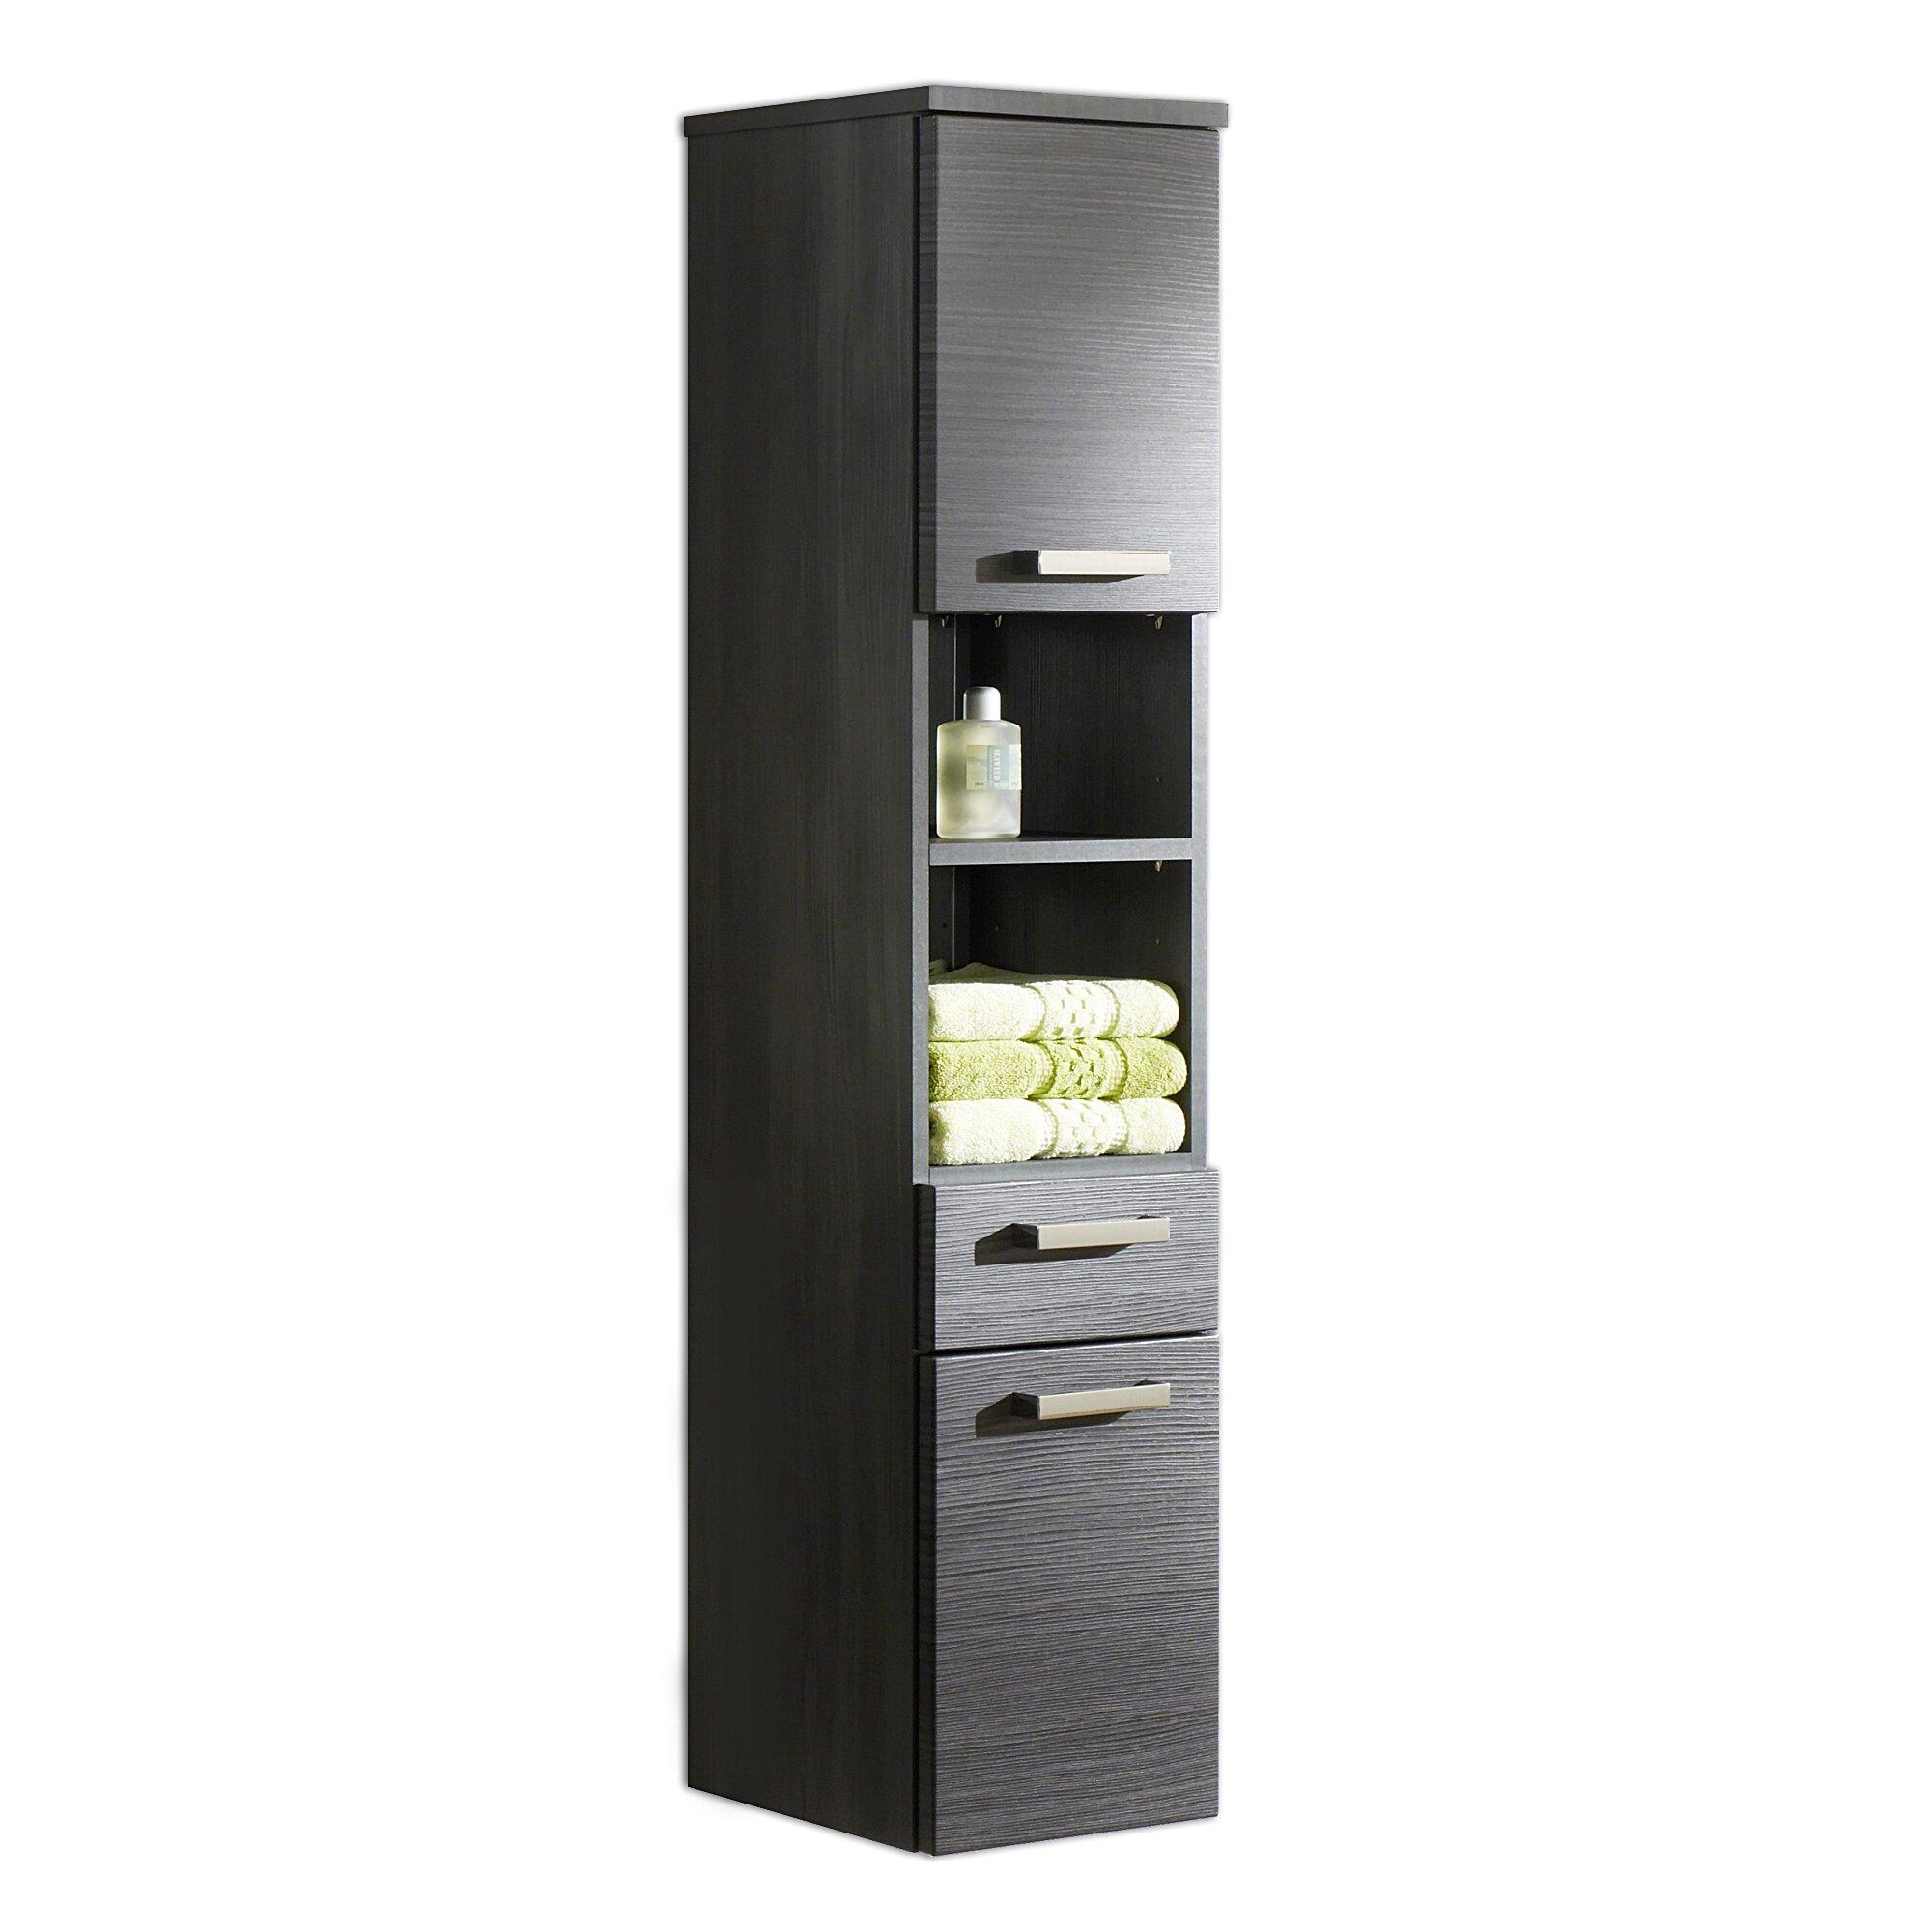 Posseik marano 30 x 135cm wall mounted cabinet reviews for 96 bathroom cabinets